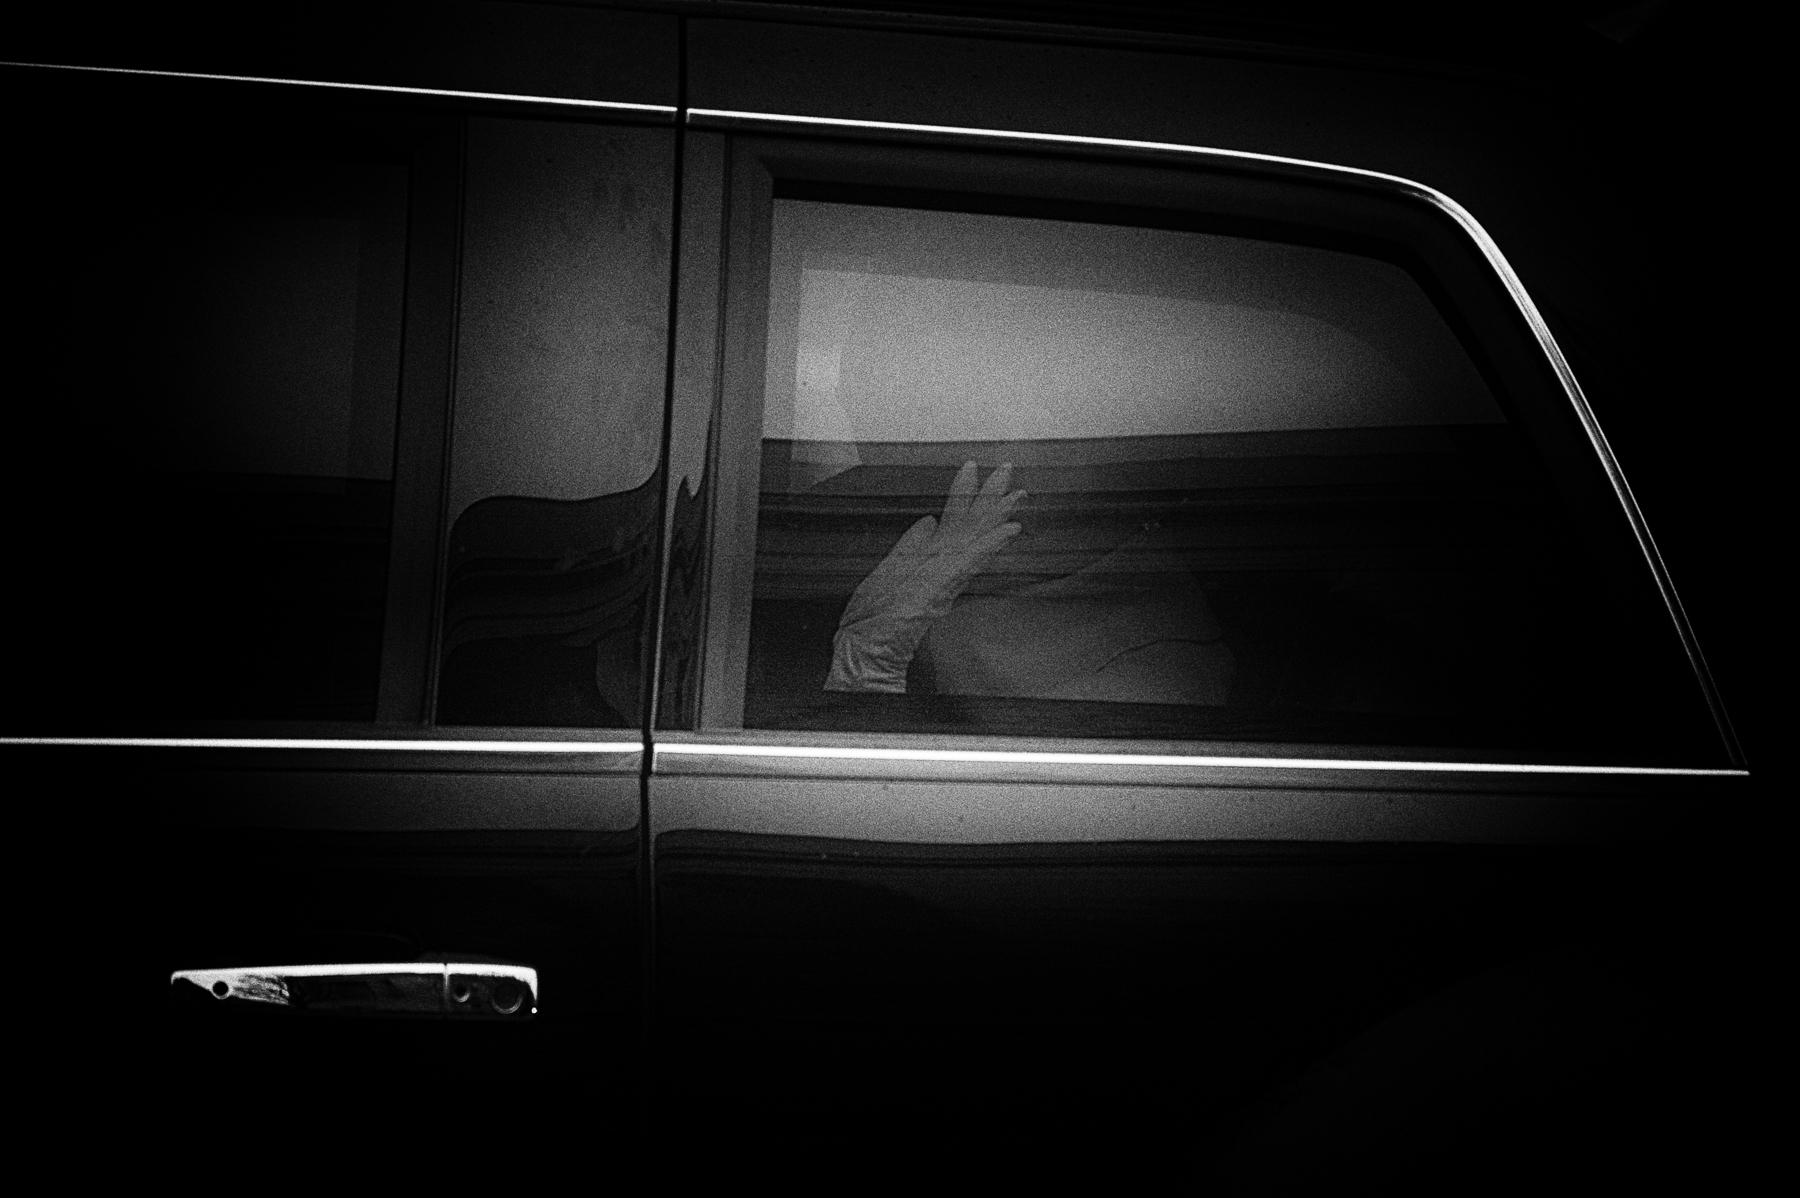 Beata Wolniewicz_A journey to the White House.jpg